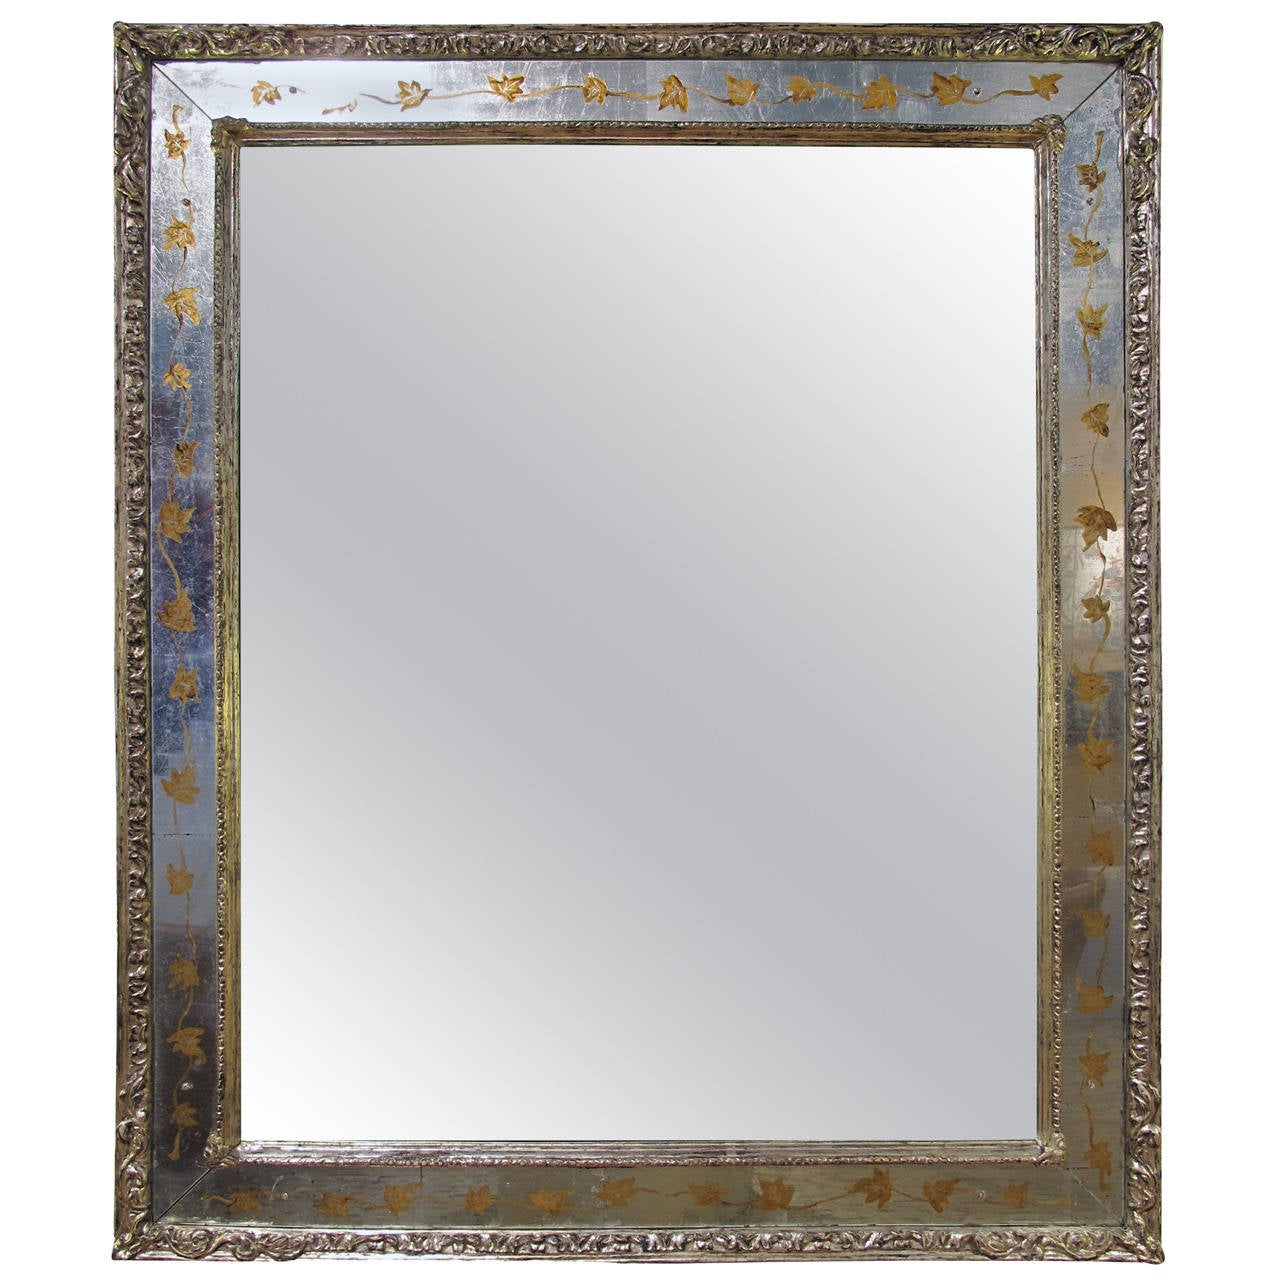 An elegant french 1940 39 s verre eglomise mirror by jansen for Elegant mirrors